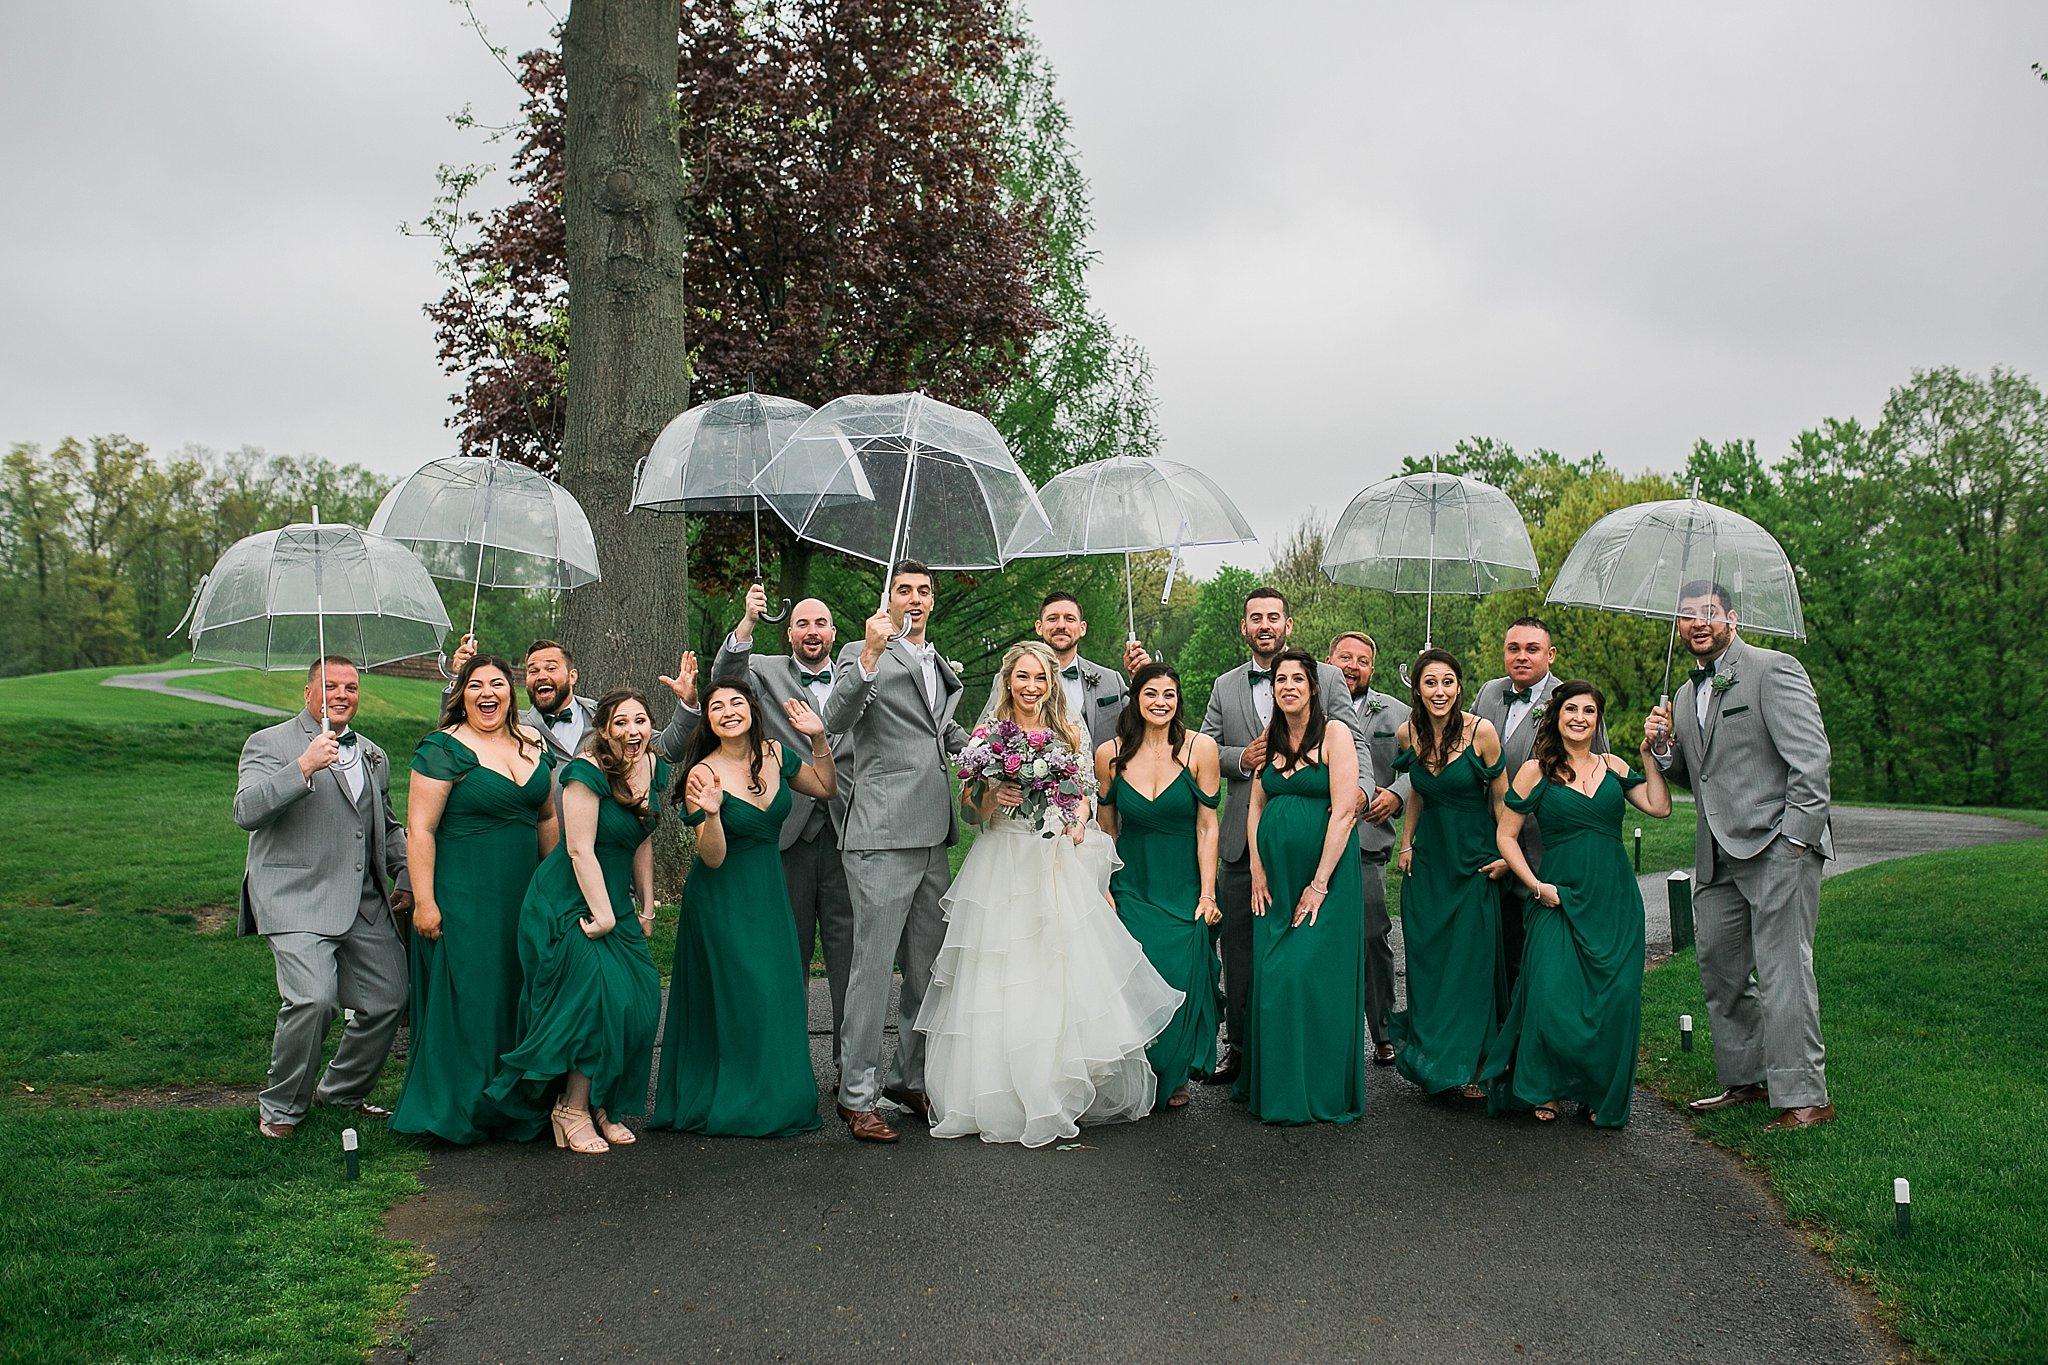 West Hills Country Club Wedding Hudson Valley Wedding Photographer Sweet Alice Photography 63.jpg